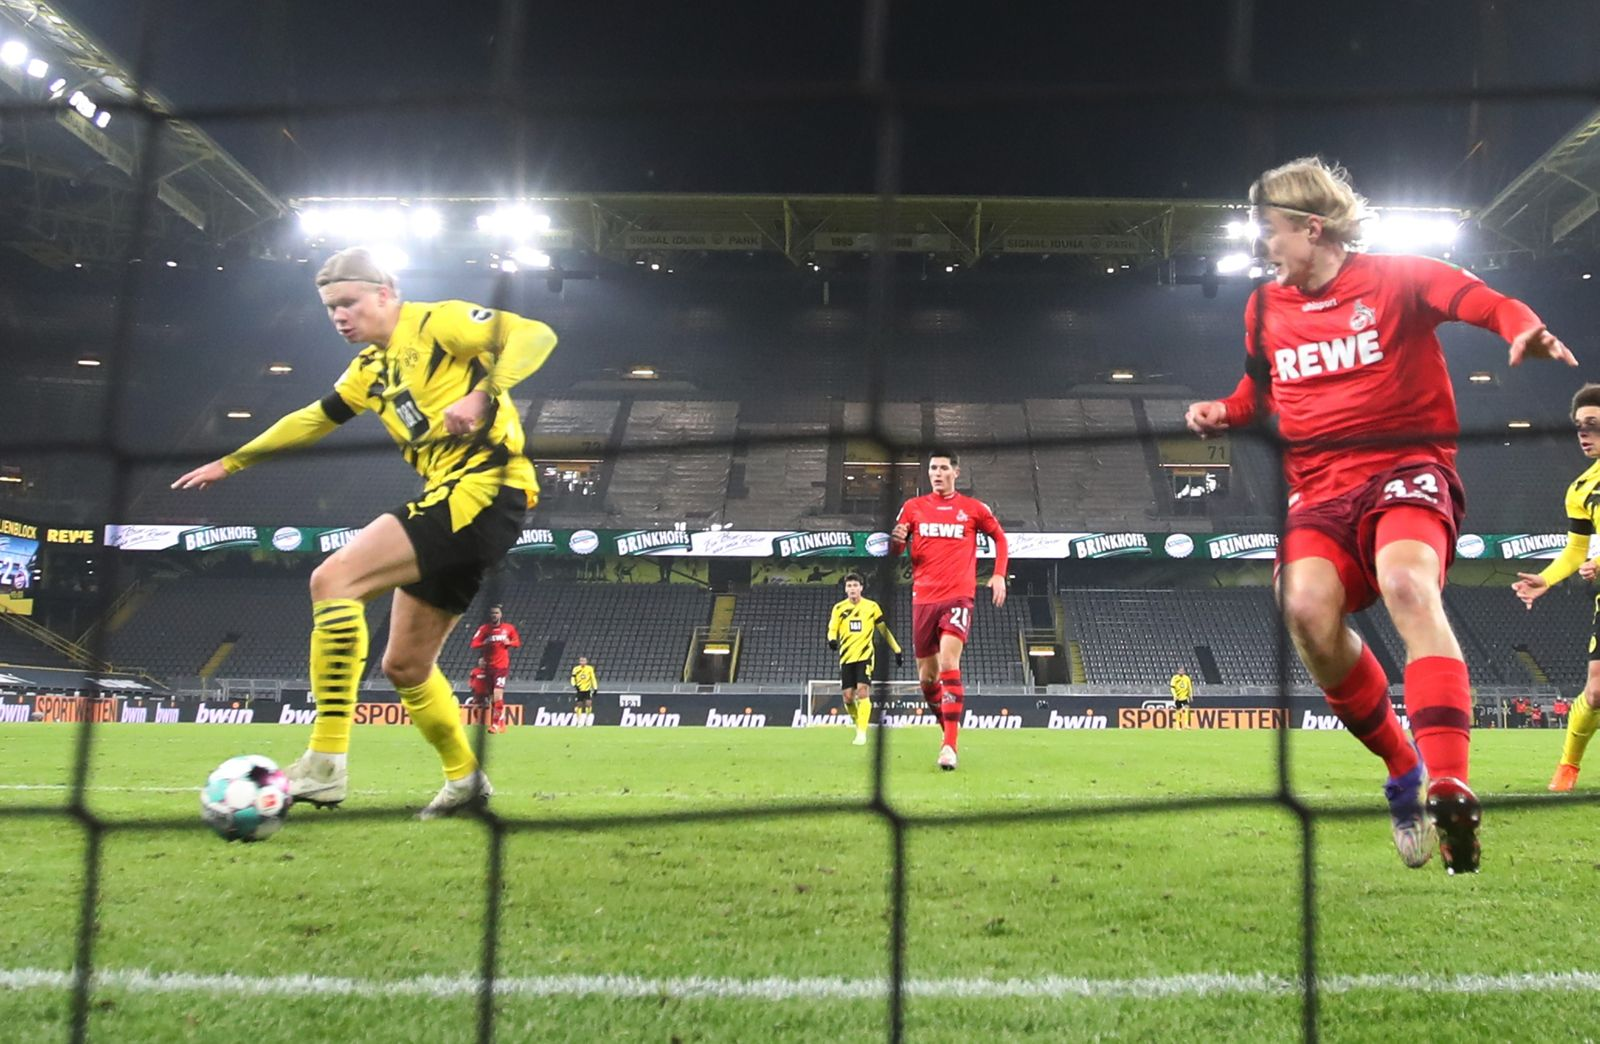 Borussia Dortmund vs. 1. FC Cologne, Germany - 28 Nov 2020